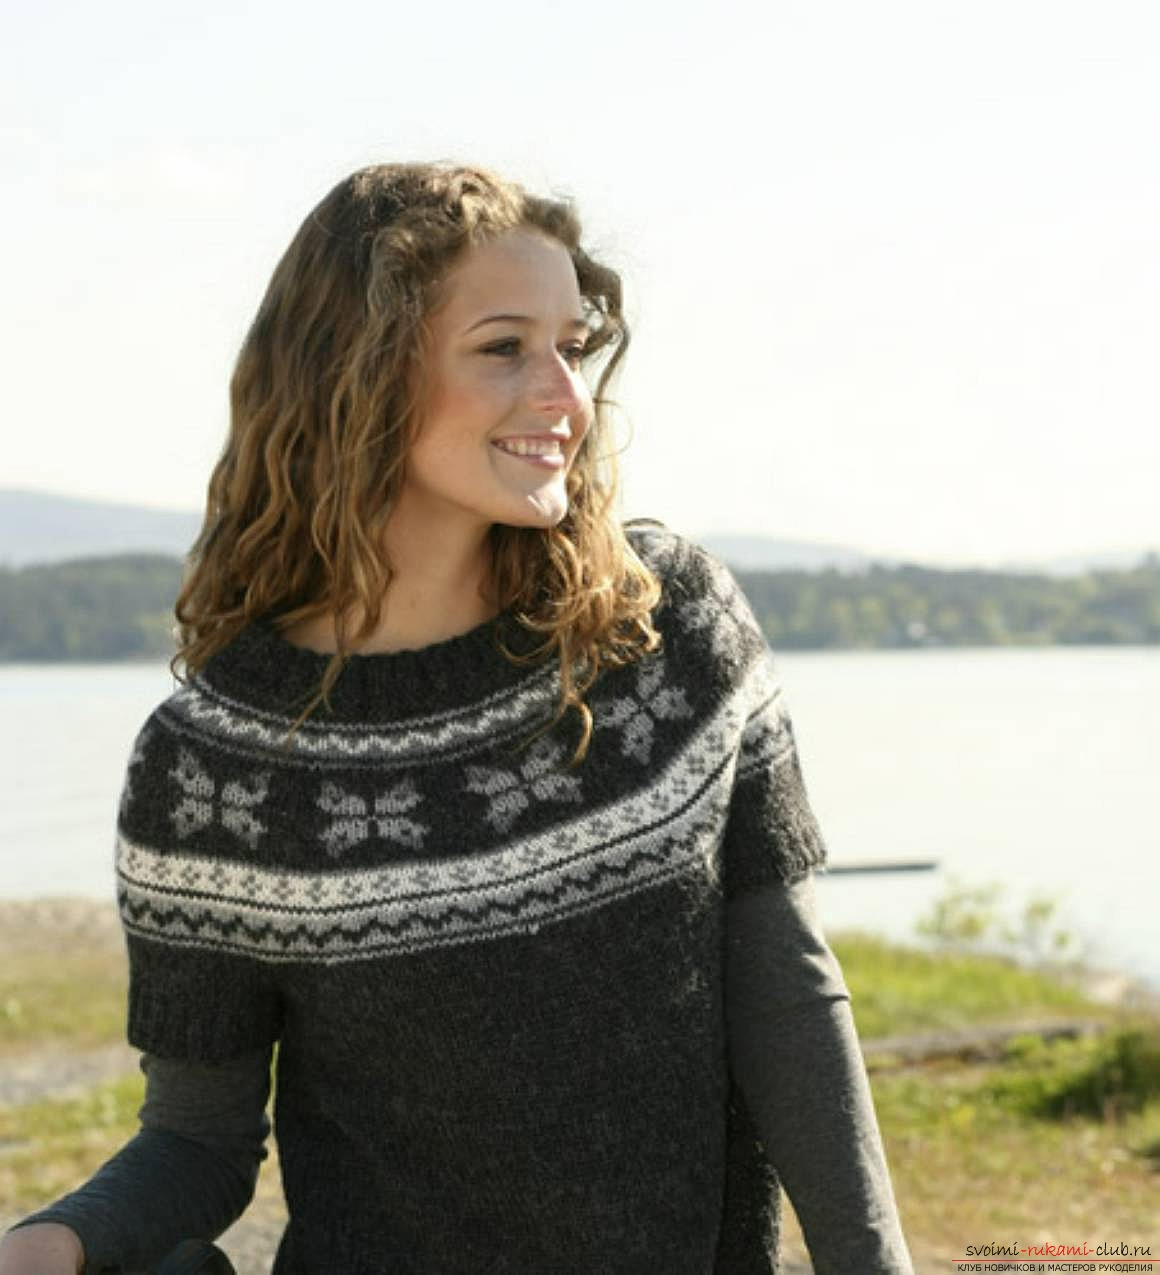 вязаный на спицах женский свитер с норвежским узором. Фото №3